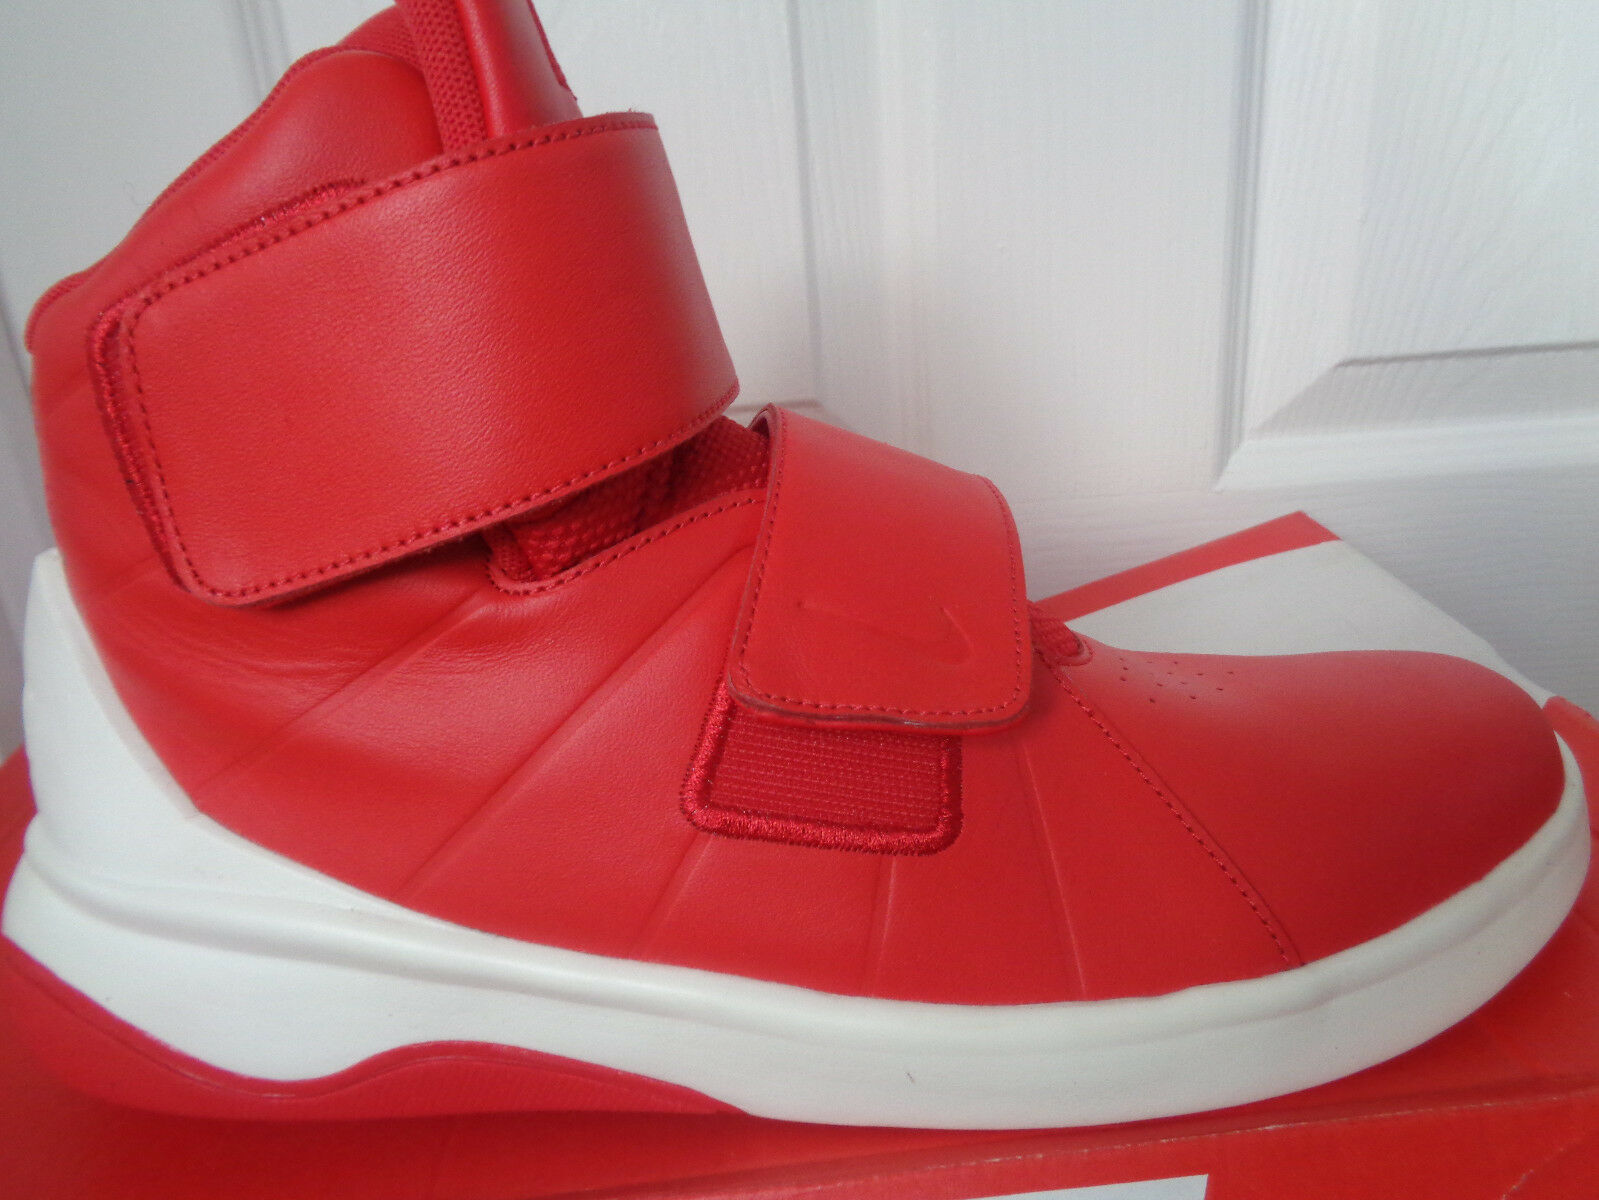 Nike Marxman mens sneakerboot black white 832764 600 eu 44 us 10 NEW+BOX